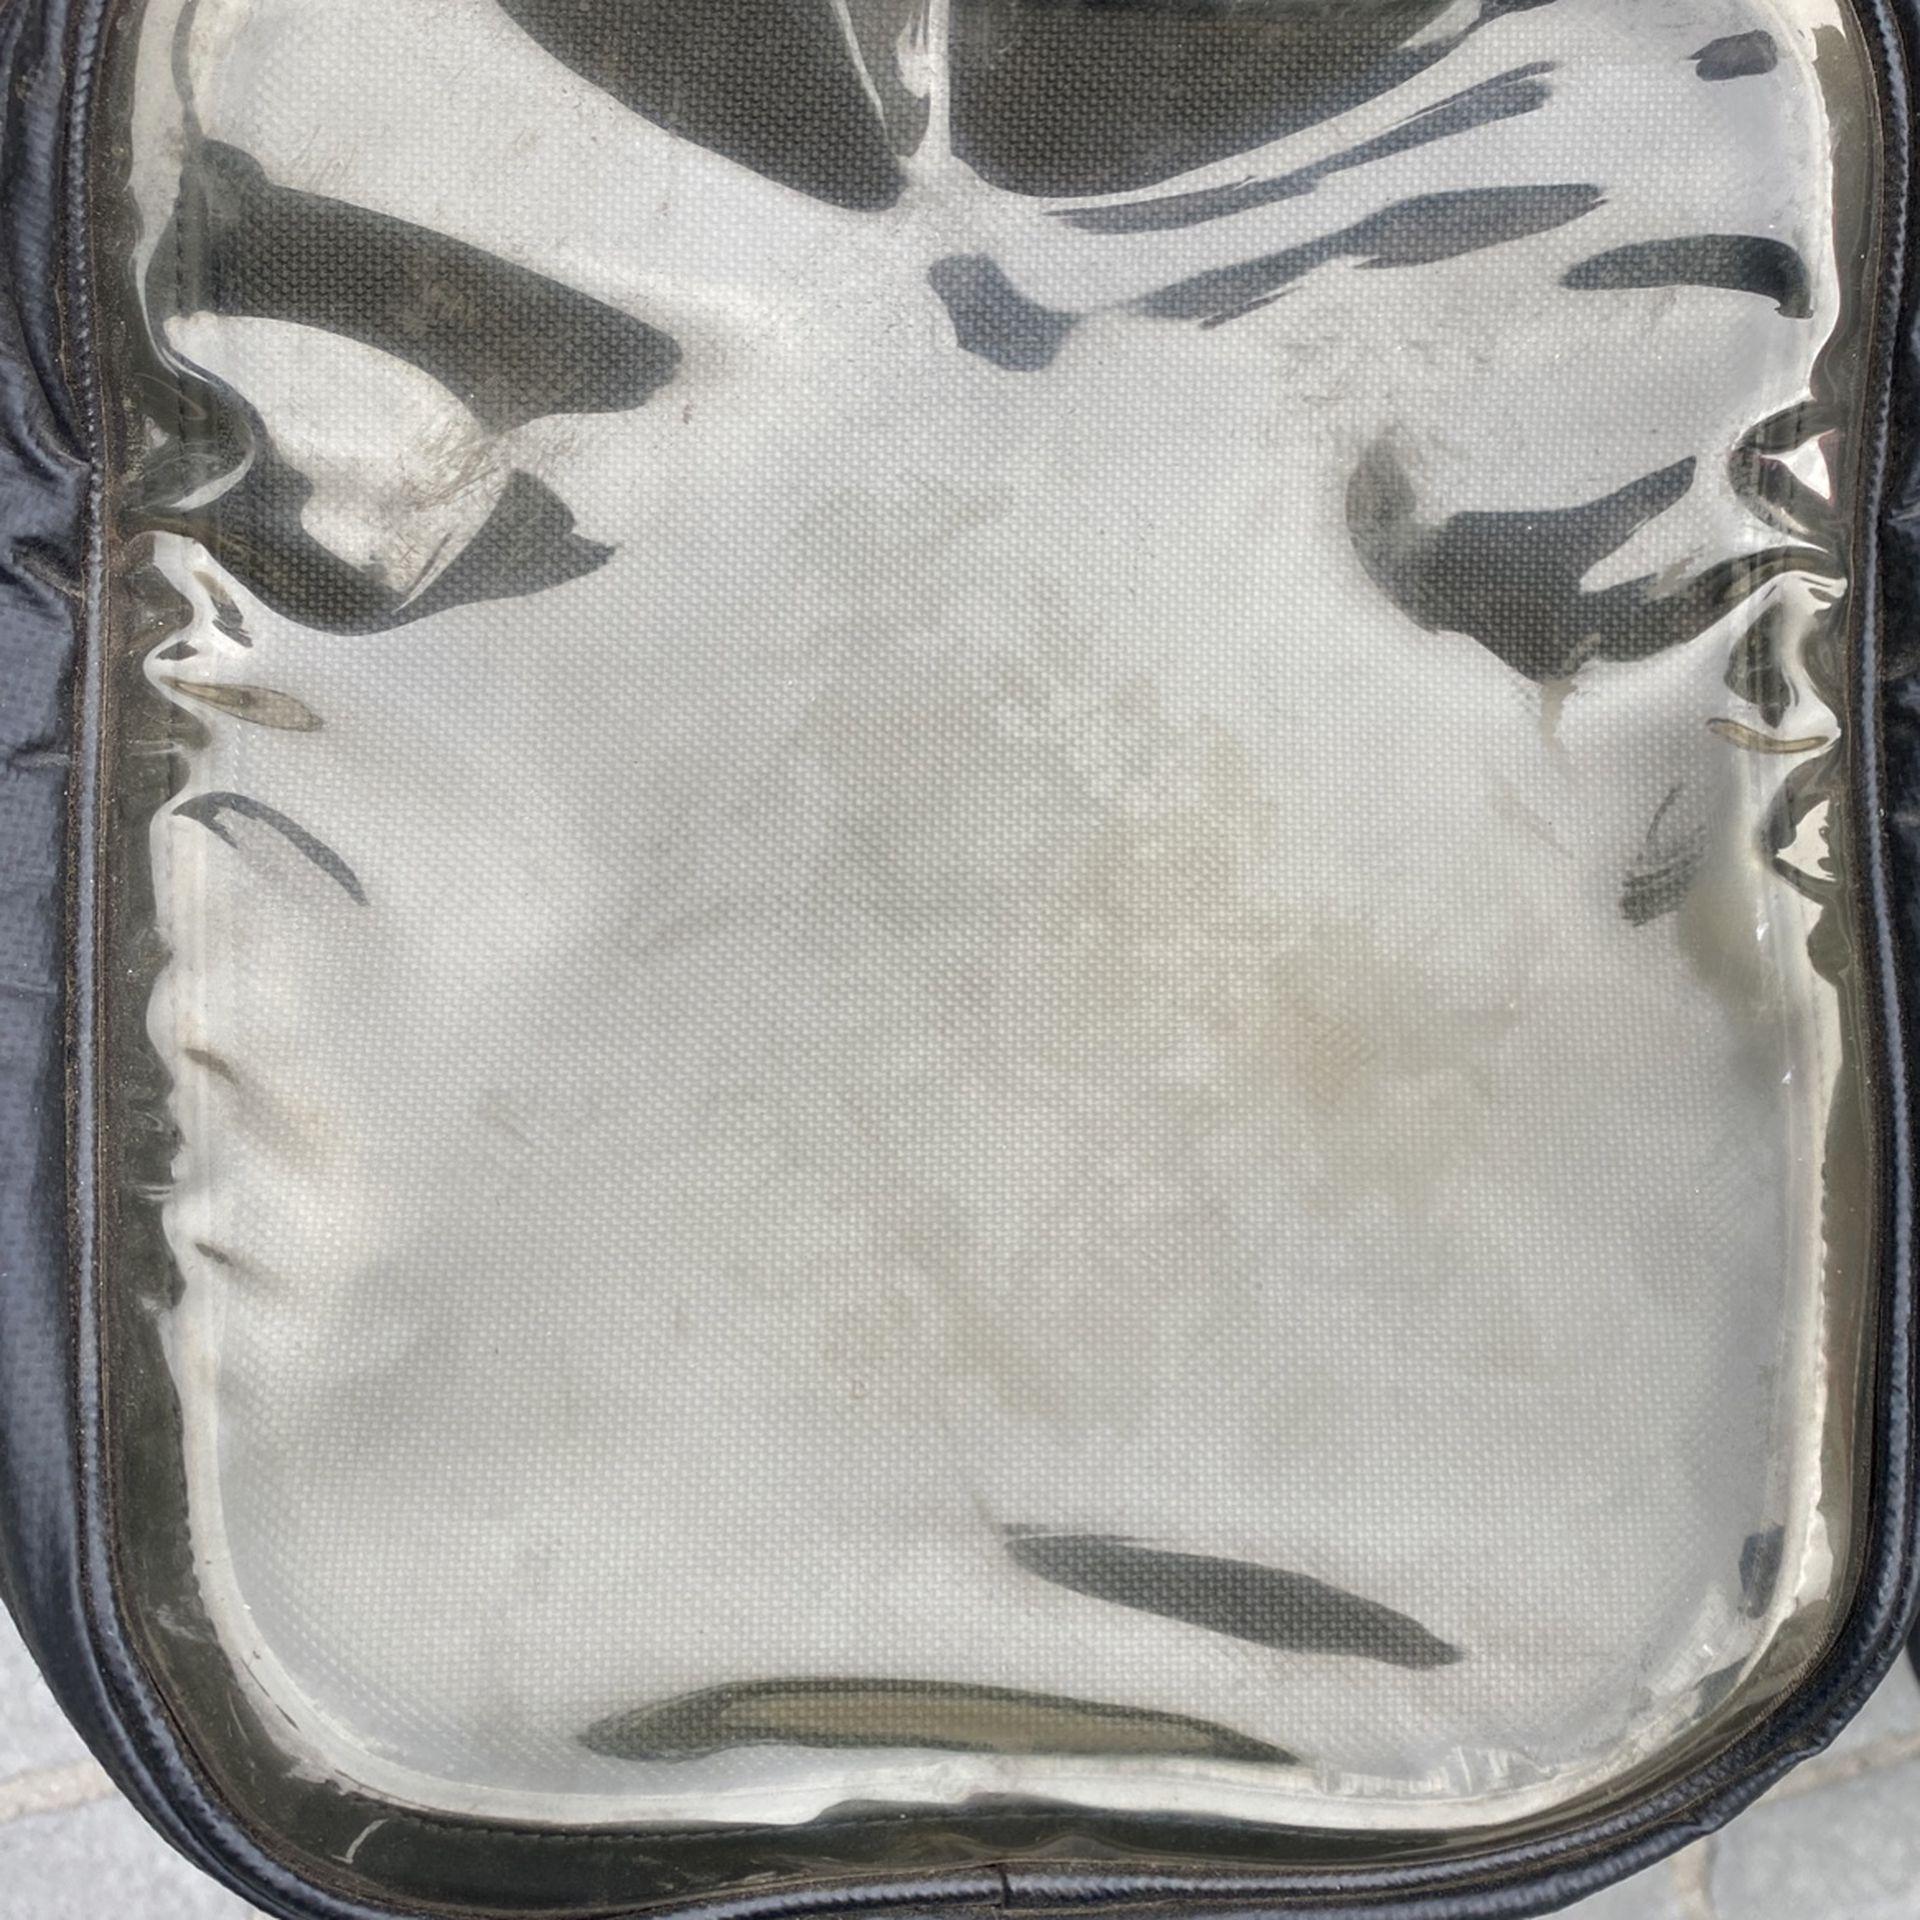 R1200 GS Tank Bag